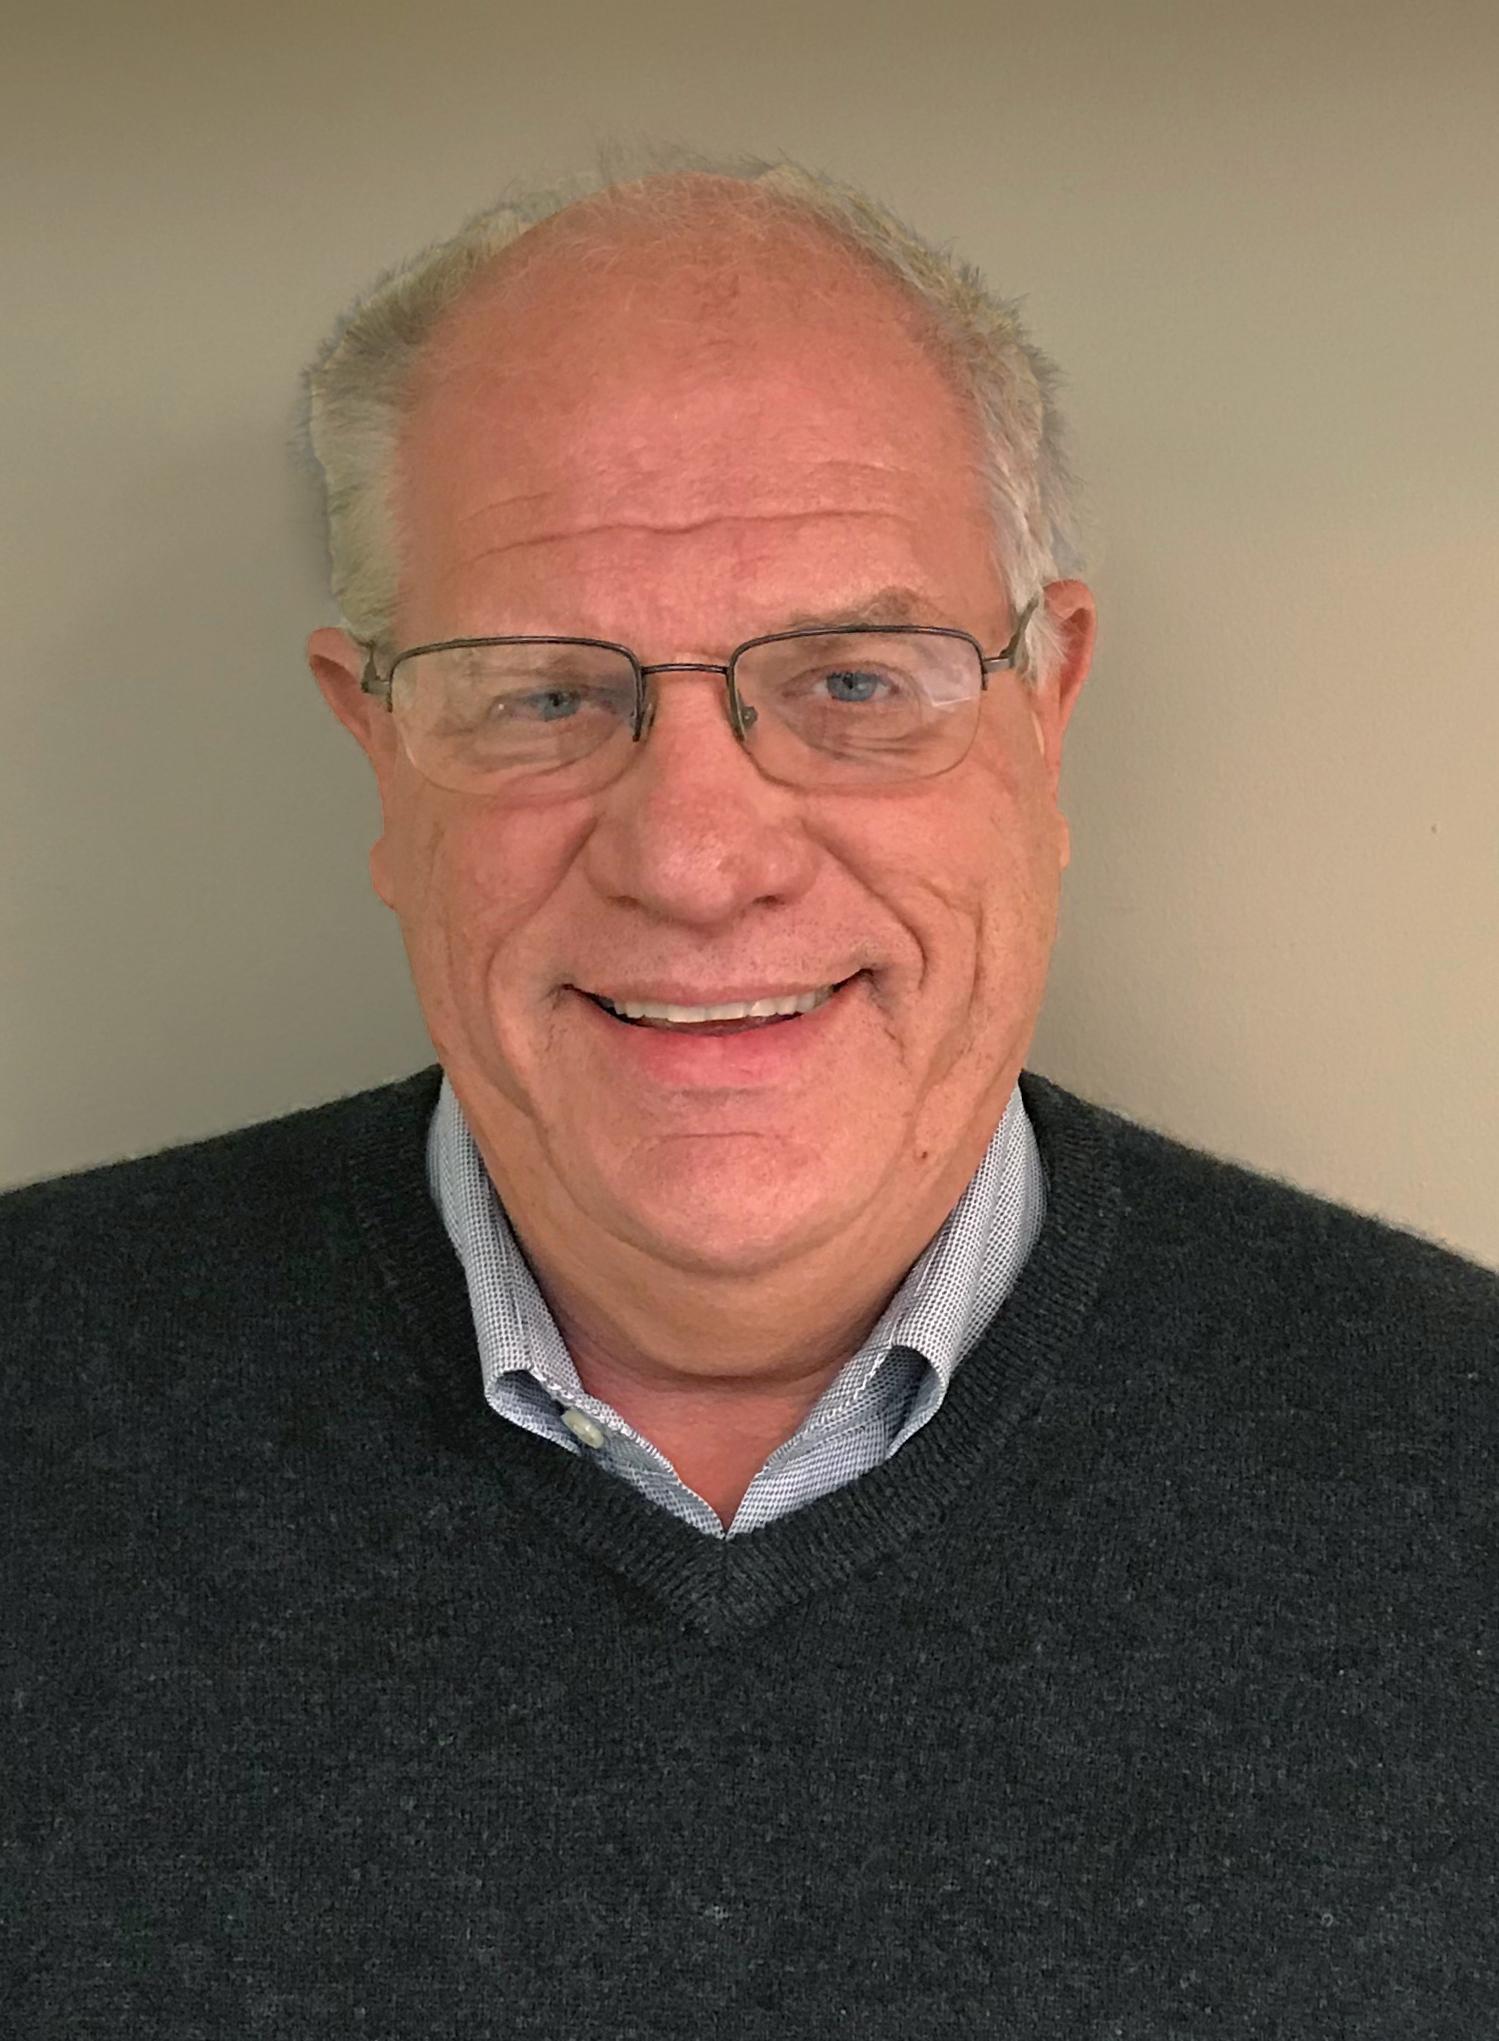 Gary L. Smith, P.E., Senior Managing Engineer